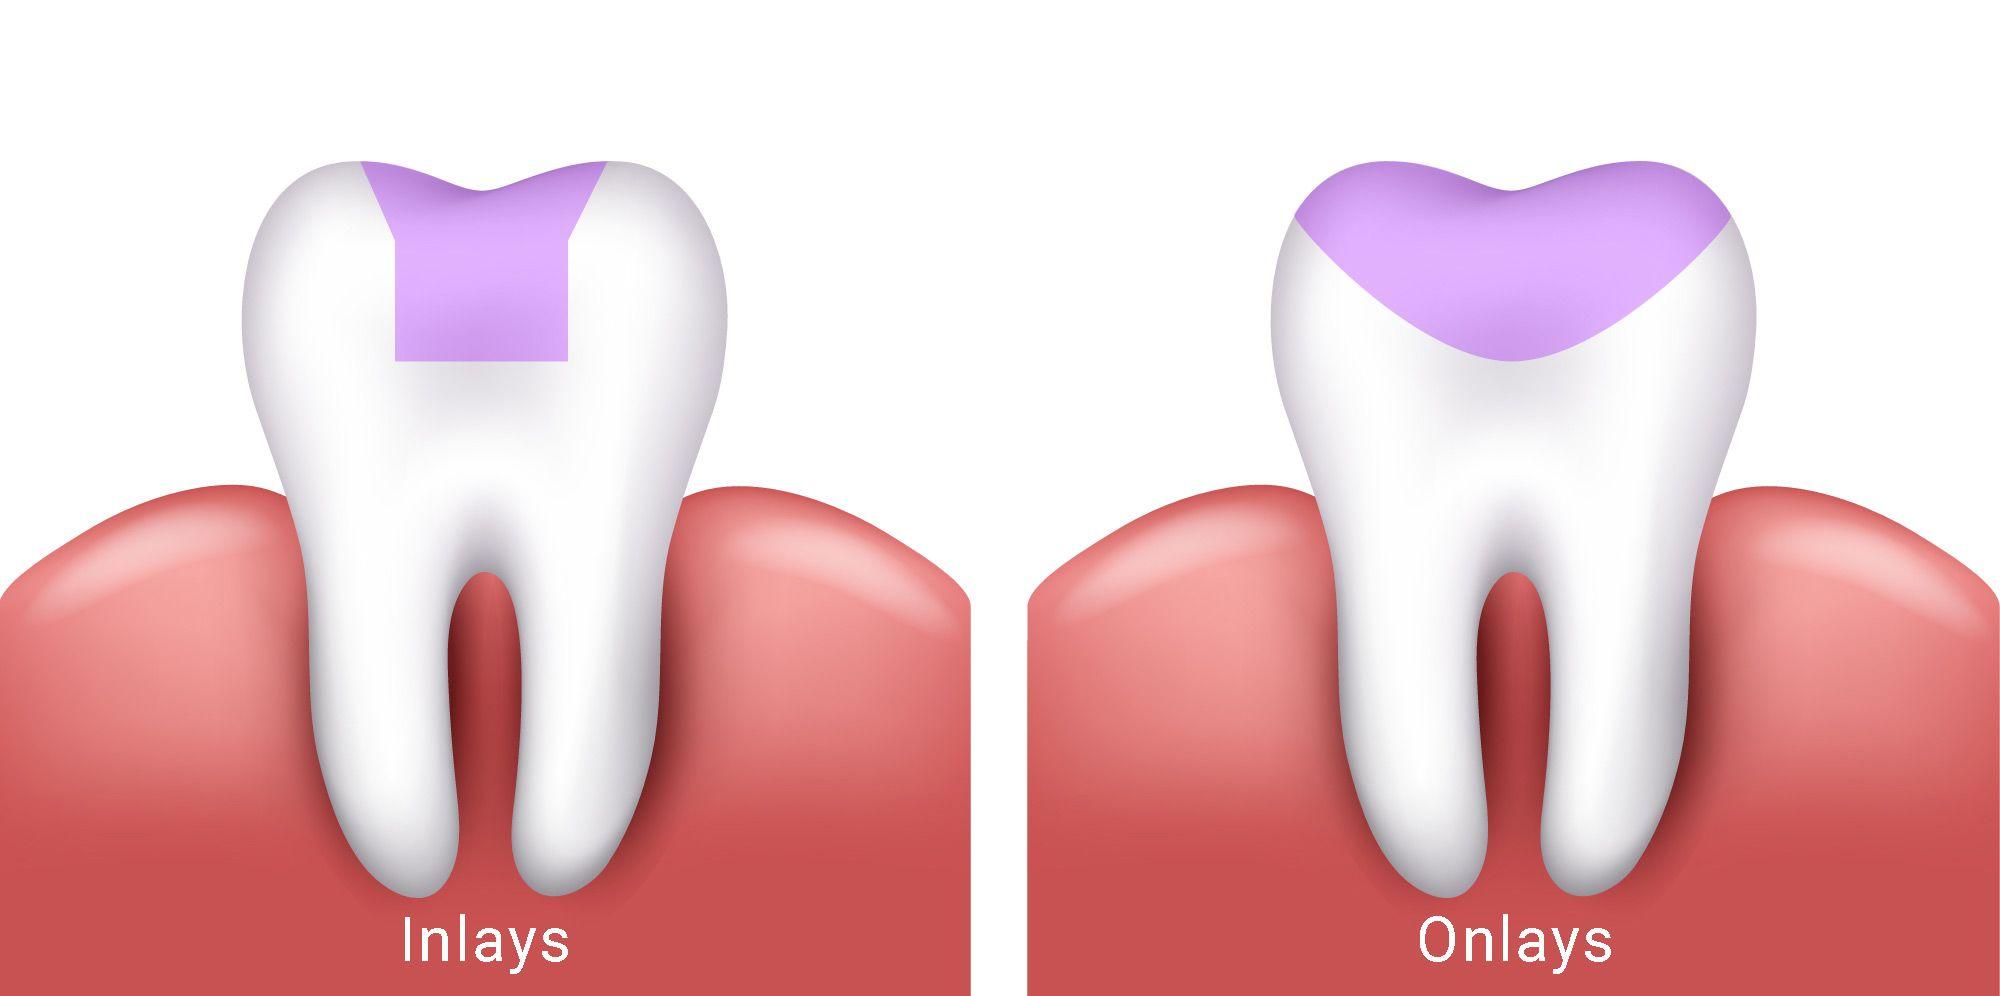 https://dentalstudioturkey.com/wp-content/uploads/2021/02/Inlays-and-Onlays2.jpg